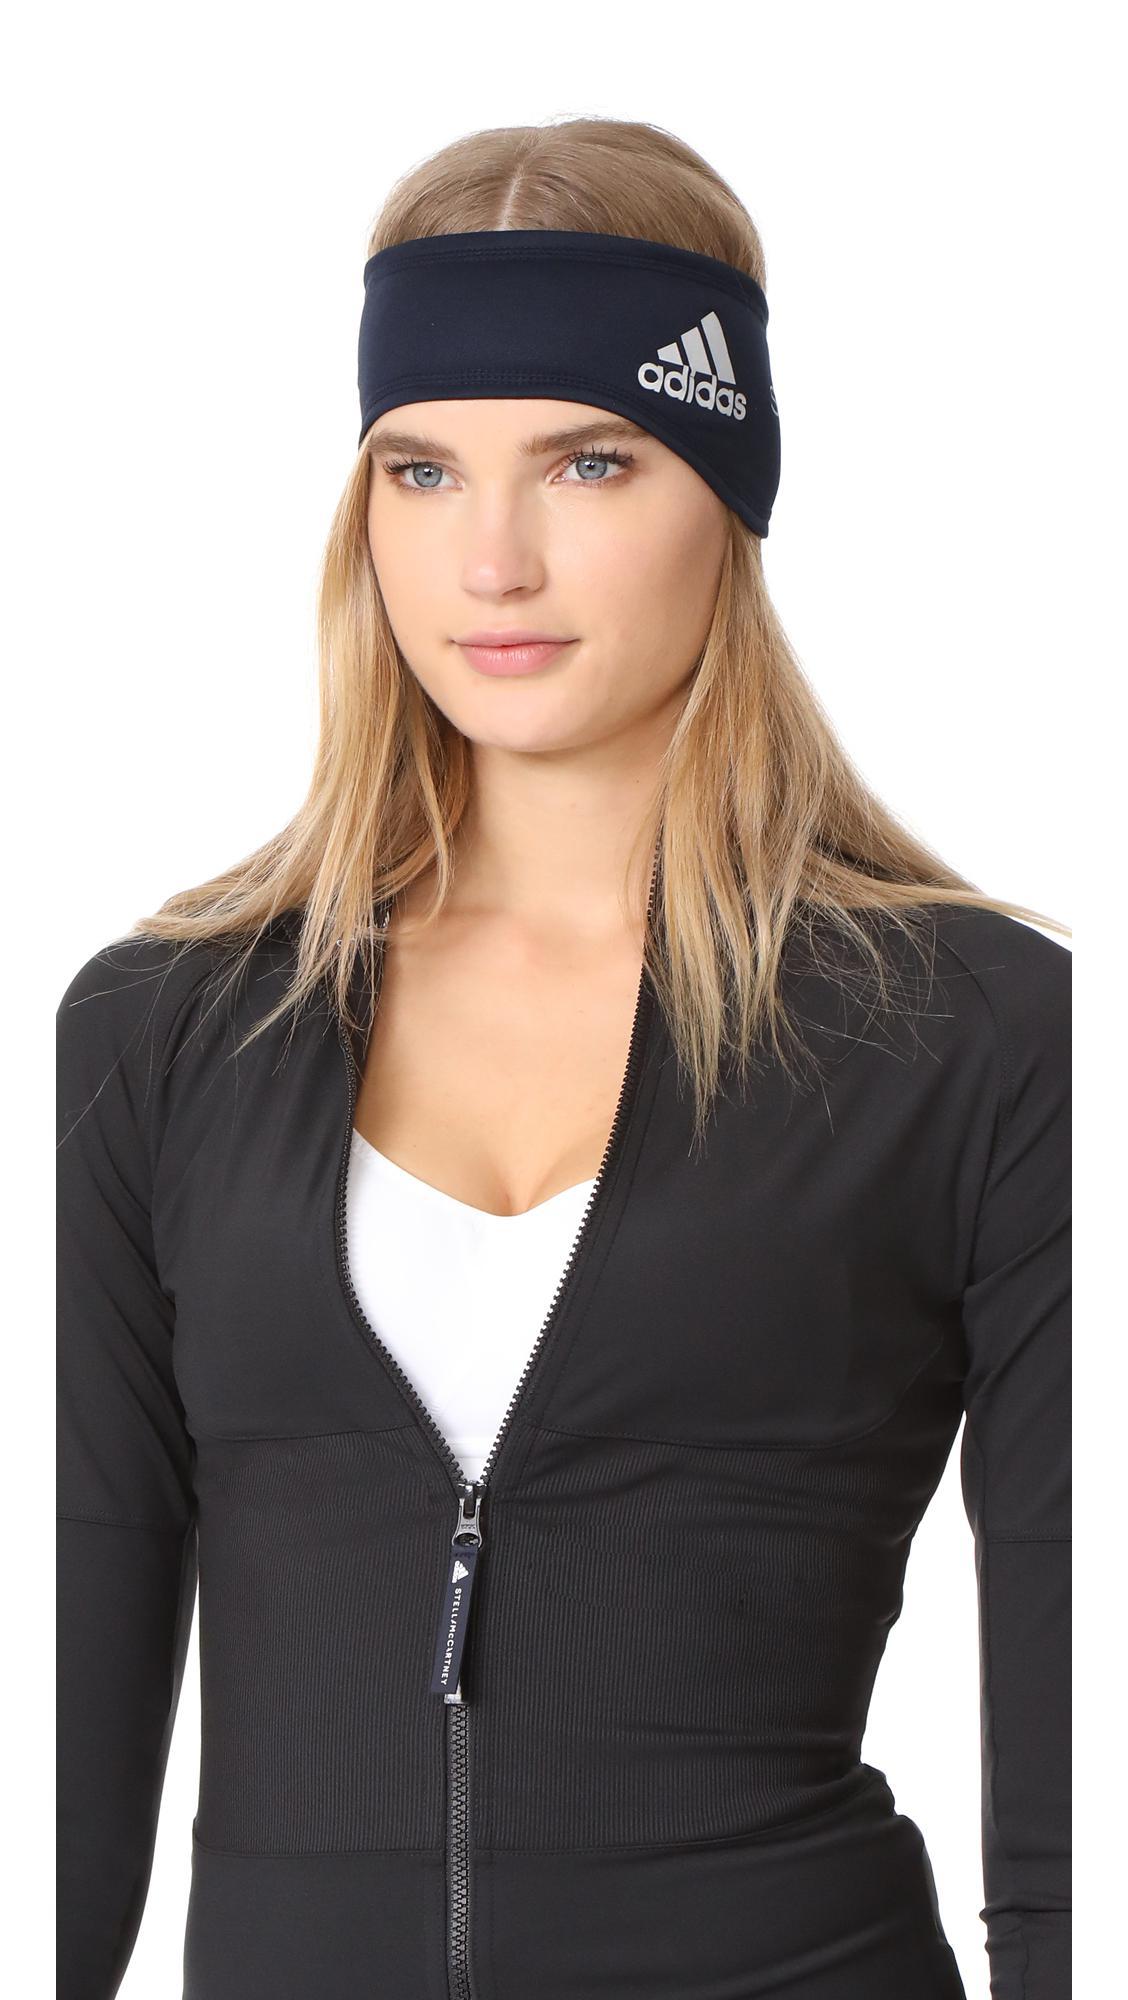 lyst adidas by stella mccartney running headband in blue. Black Bedroom Furniture Sets. Home Design Ideas